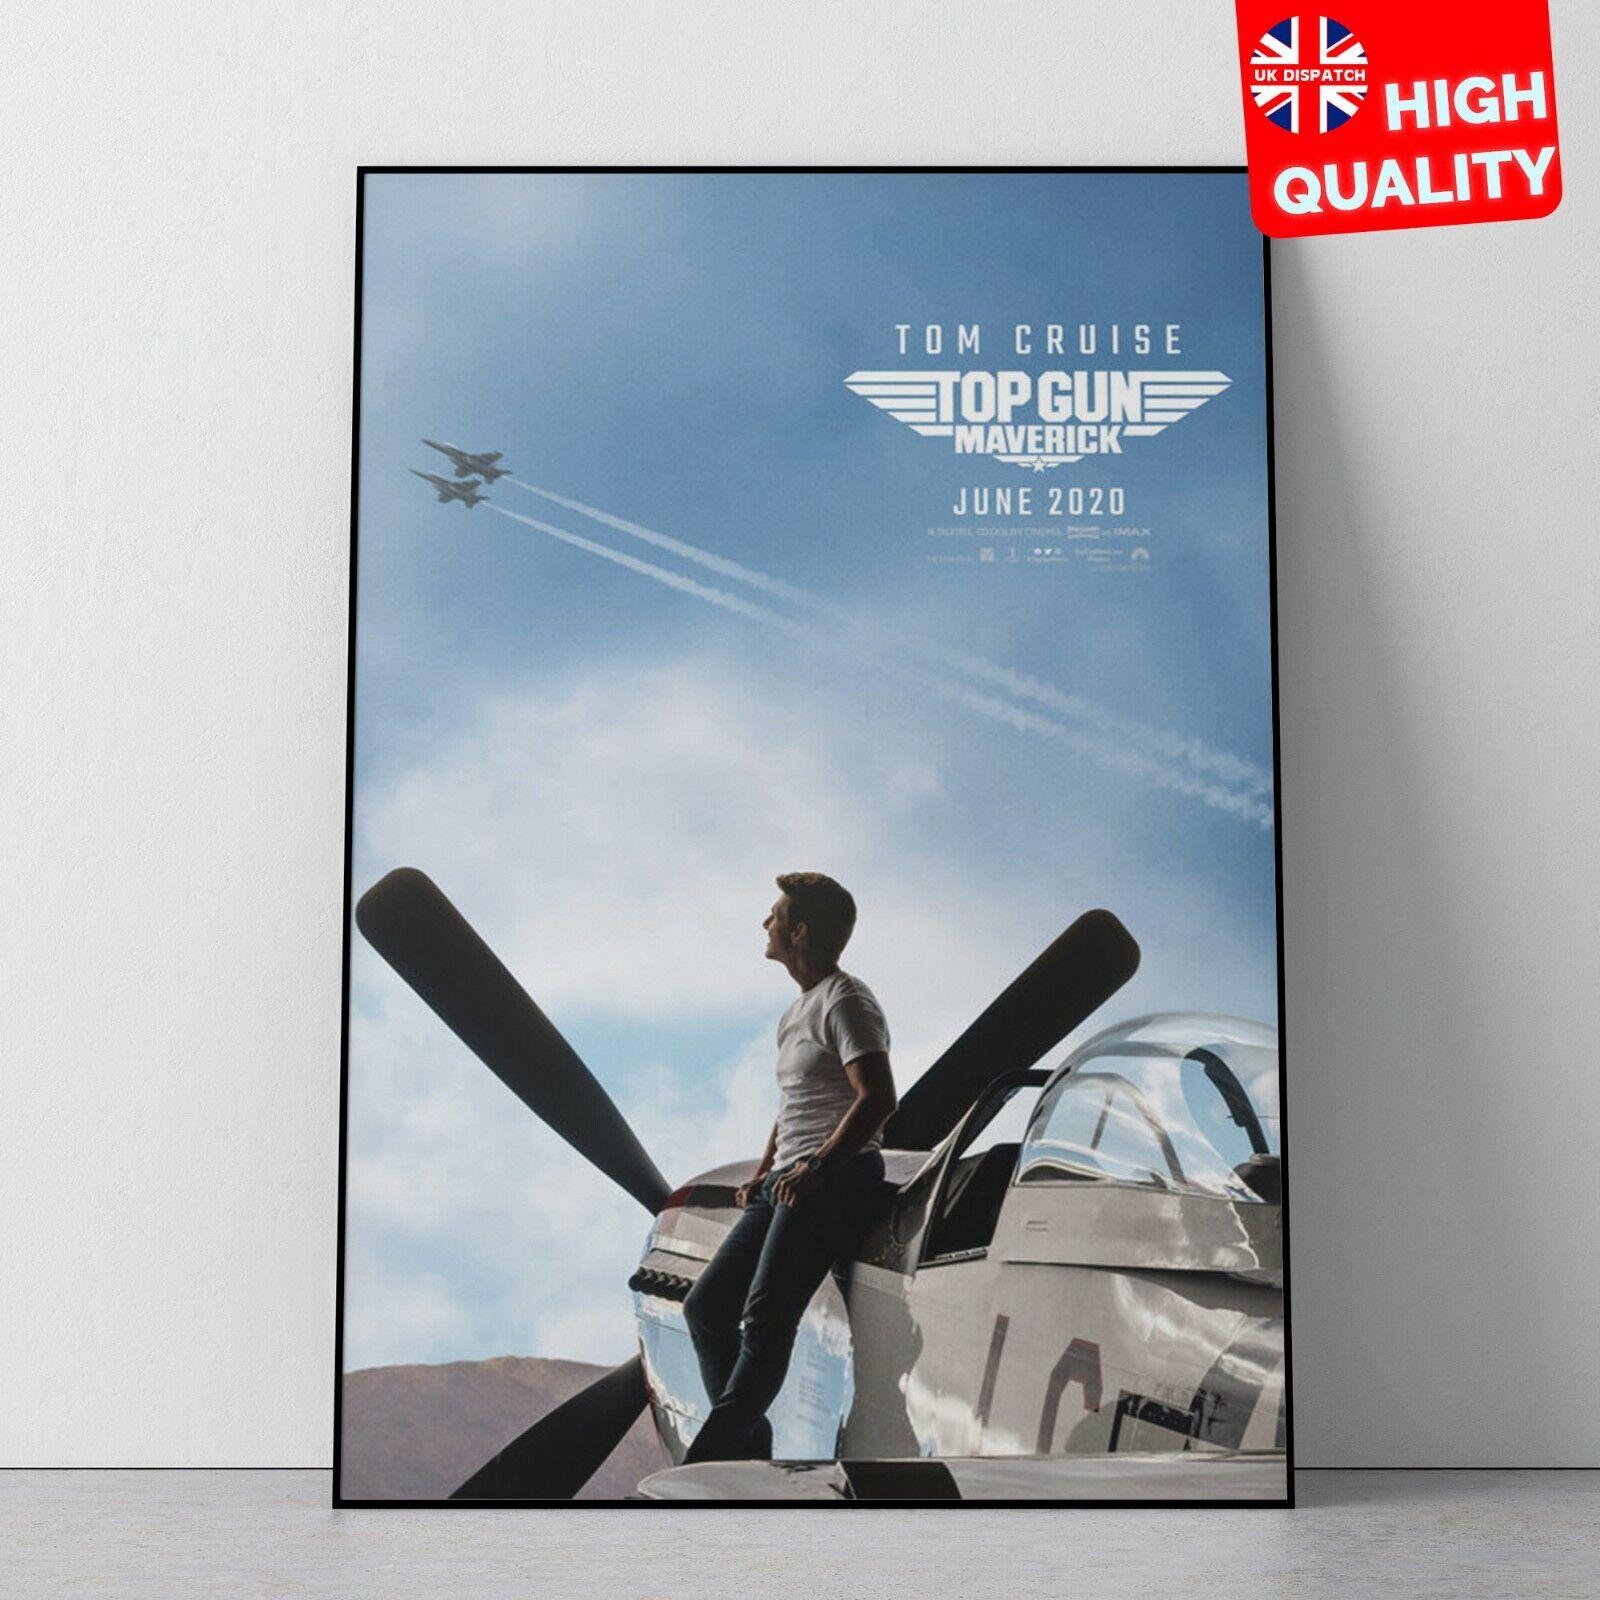 Top Gun Maverick Tom Cruise Movie Poster Art Print A0 A1 A2 A3 A4 Maxi